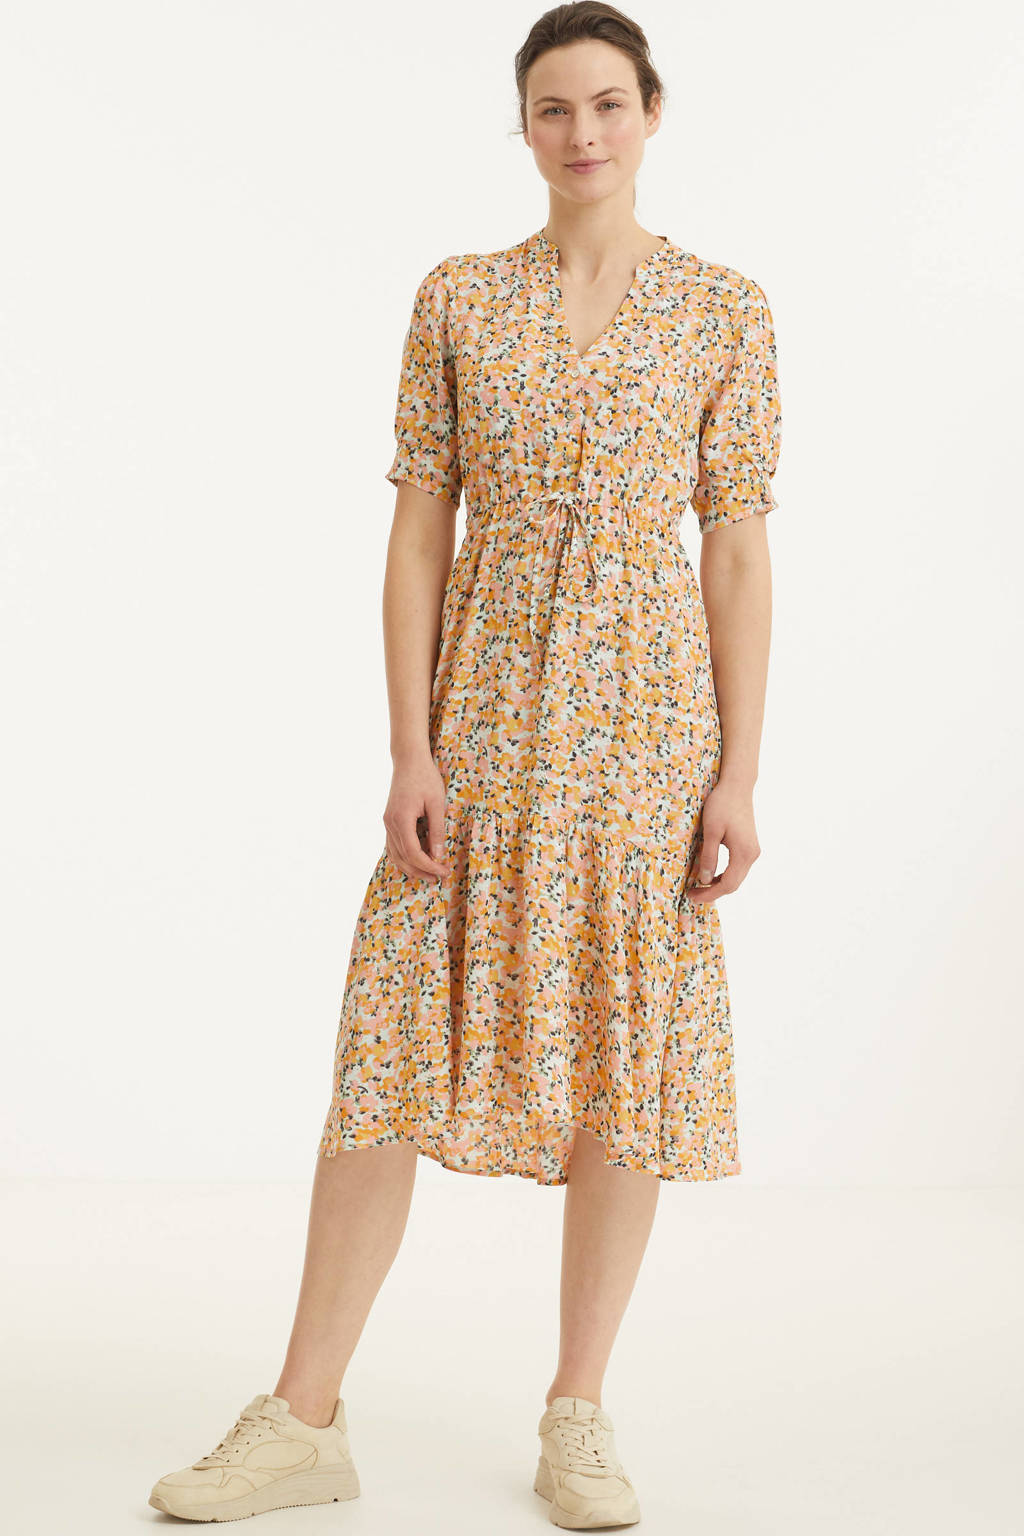 Esqualo gebloemde jurk lichtgroen/roze/oranje, Lichtgroen/roze/oranje